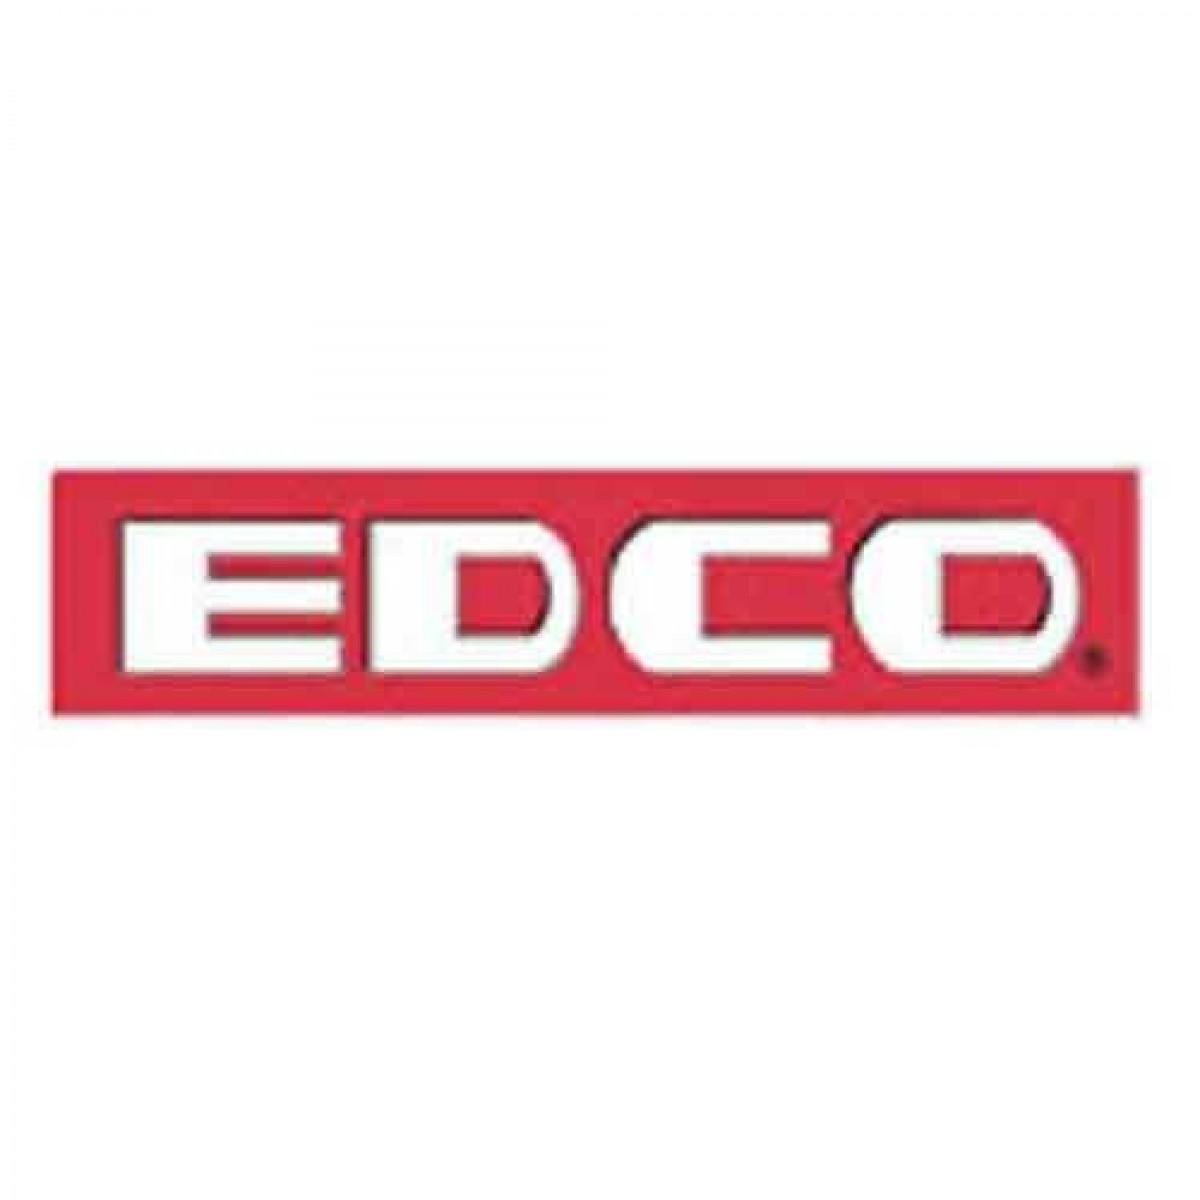 Edco Pcdyma-sert 3 Pieces New Open Box Edp2pcd-30